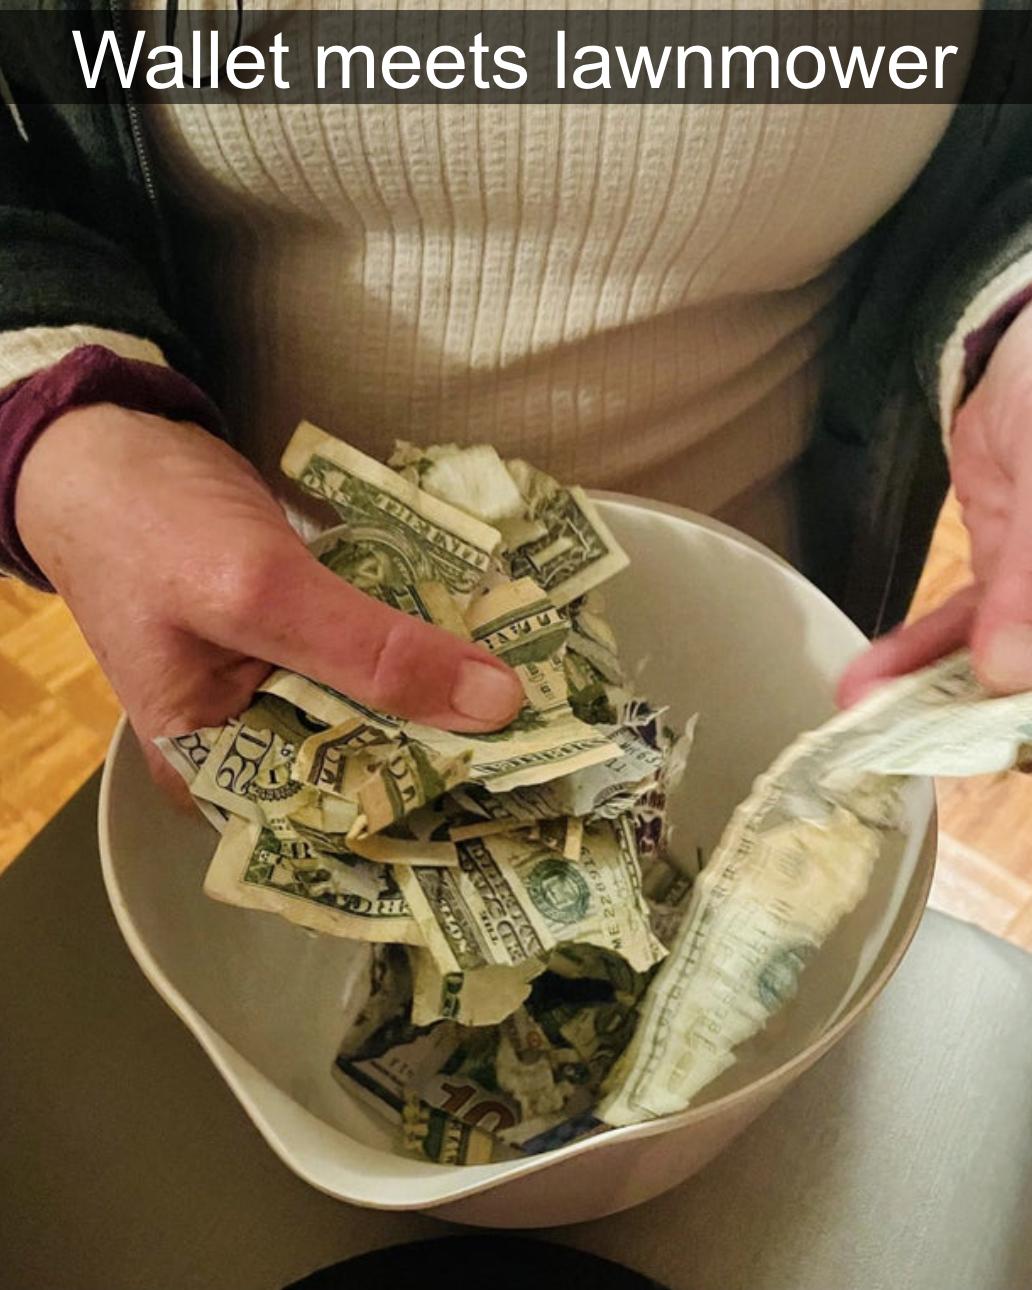 shredded money from a lawnmower